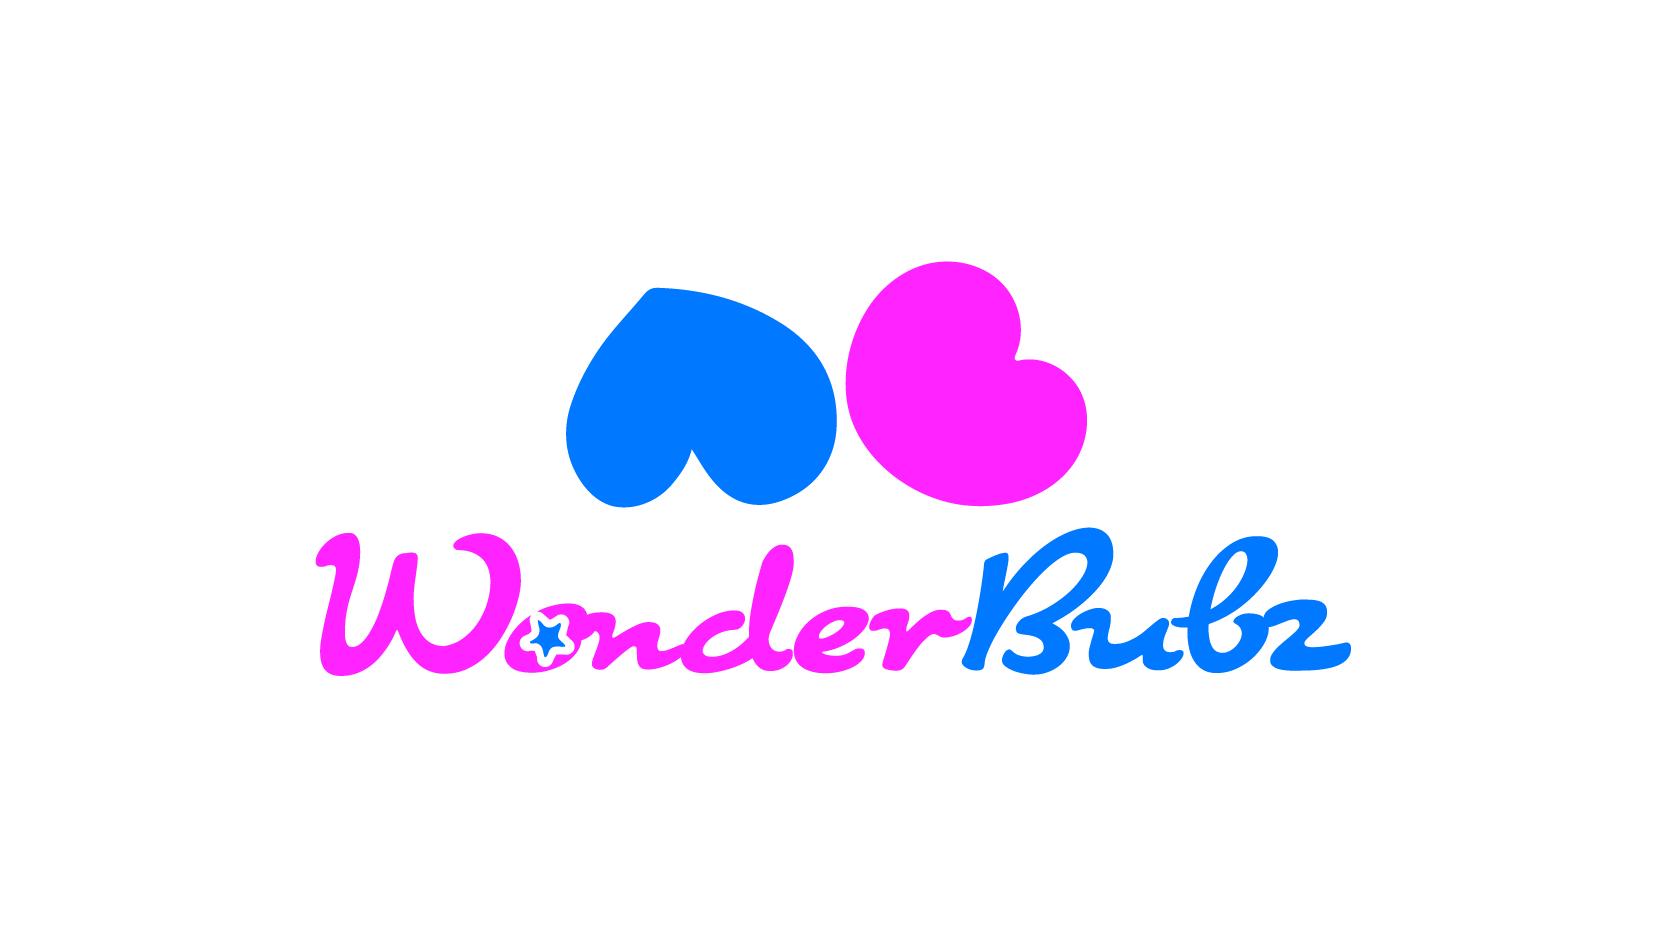 WonderBubz's logo